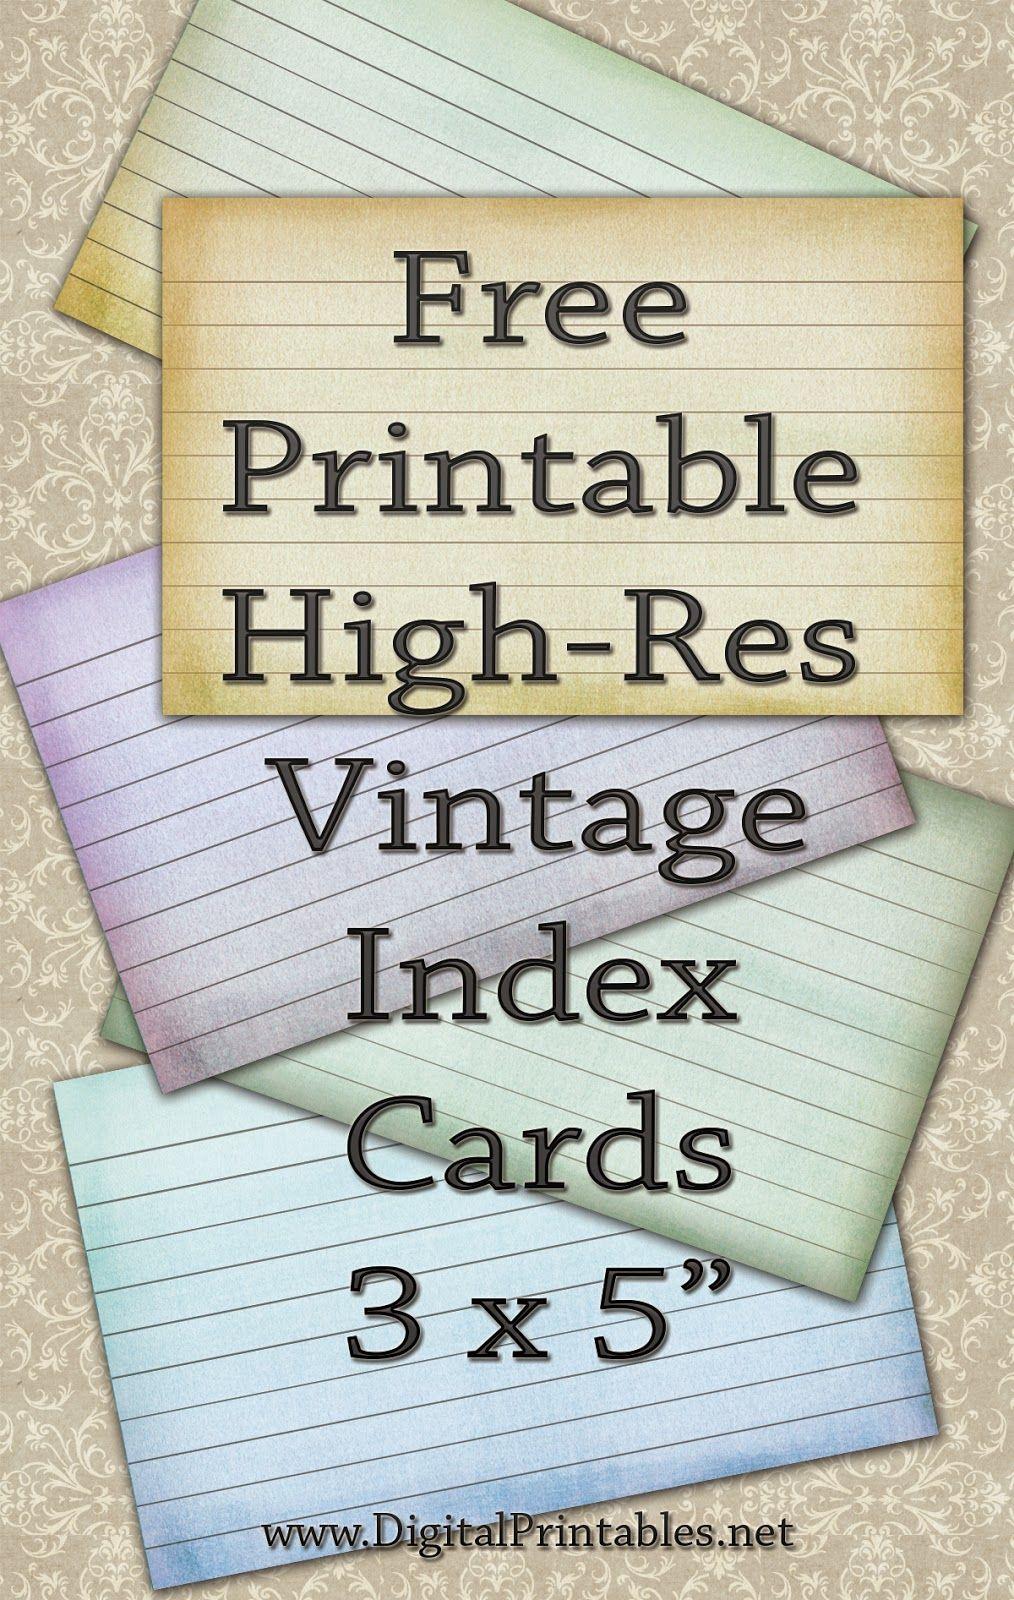 Free Printable Index Cards Vintage Look High Res Templates Printable Free Card Templates Printable Flash Card Template